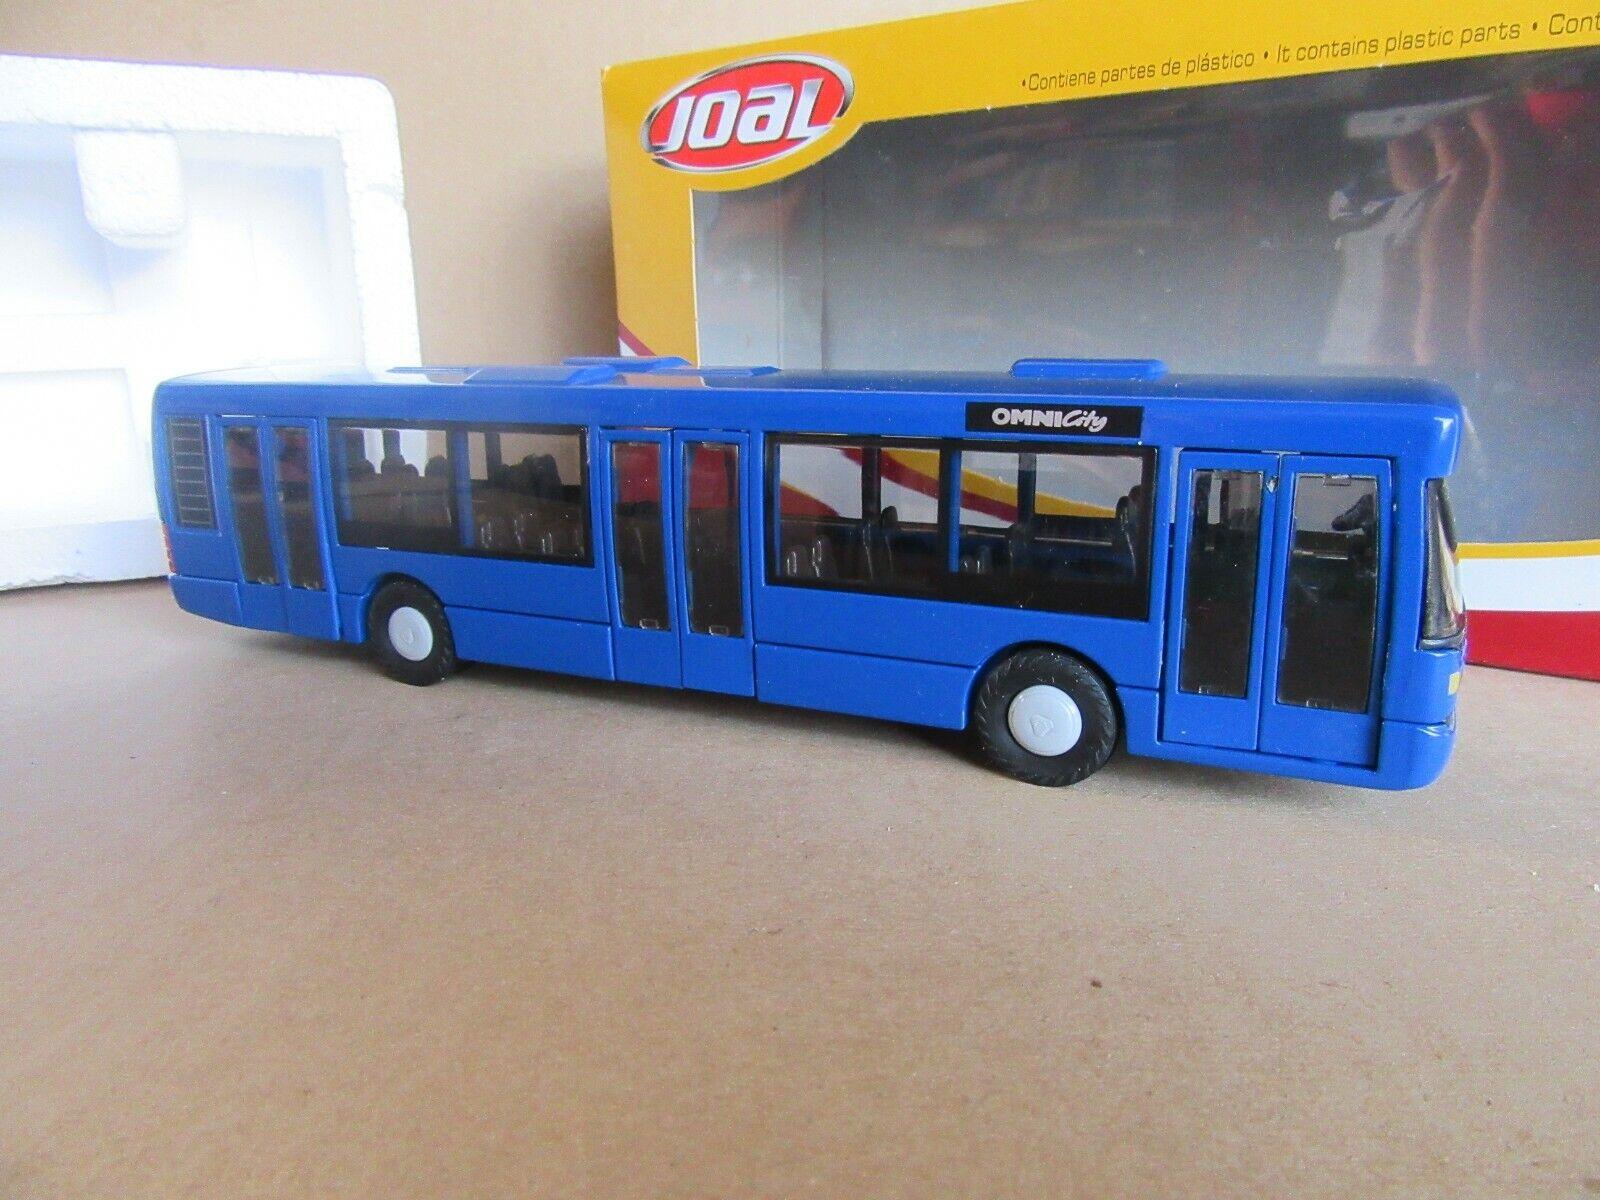 651I Joal 155 Scania Omnicity Bus blue 1 50